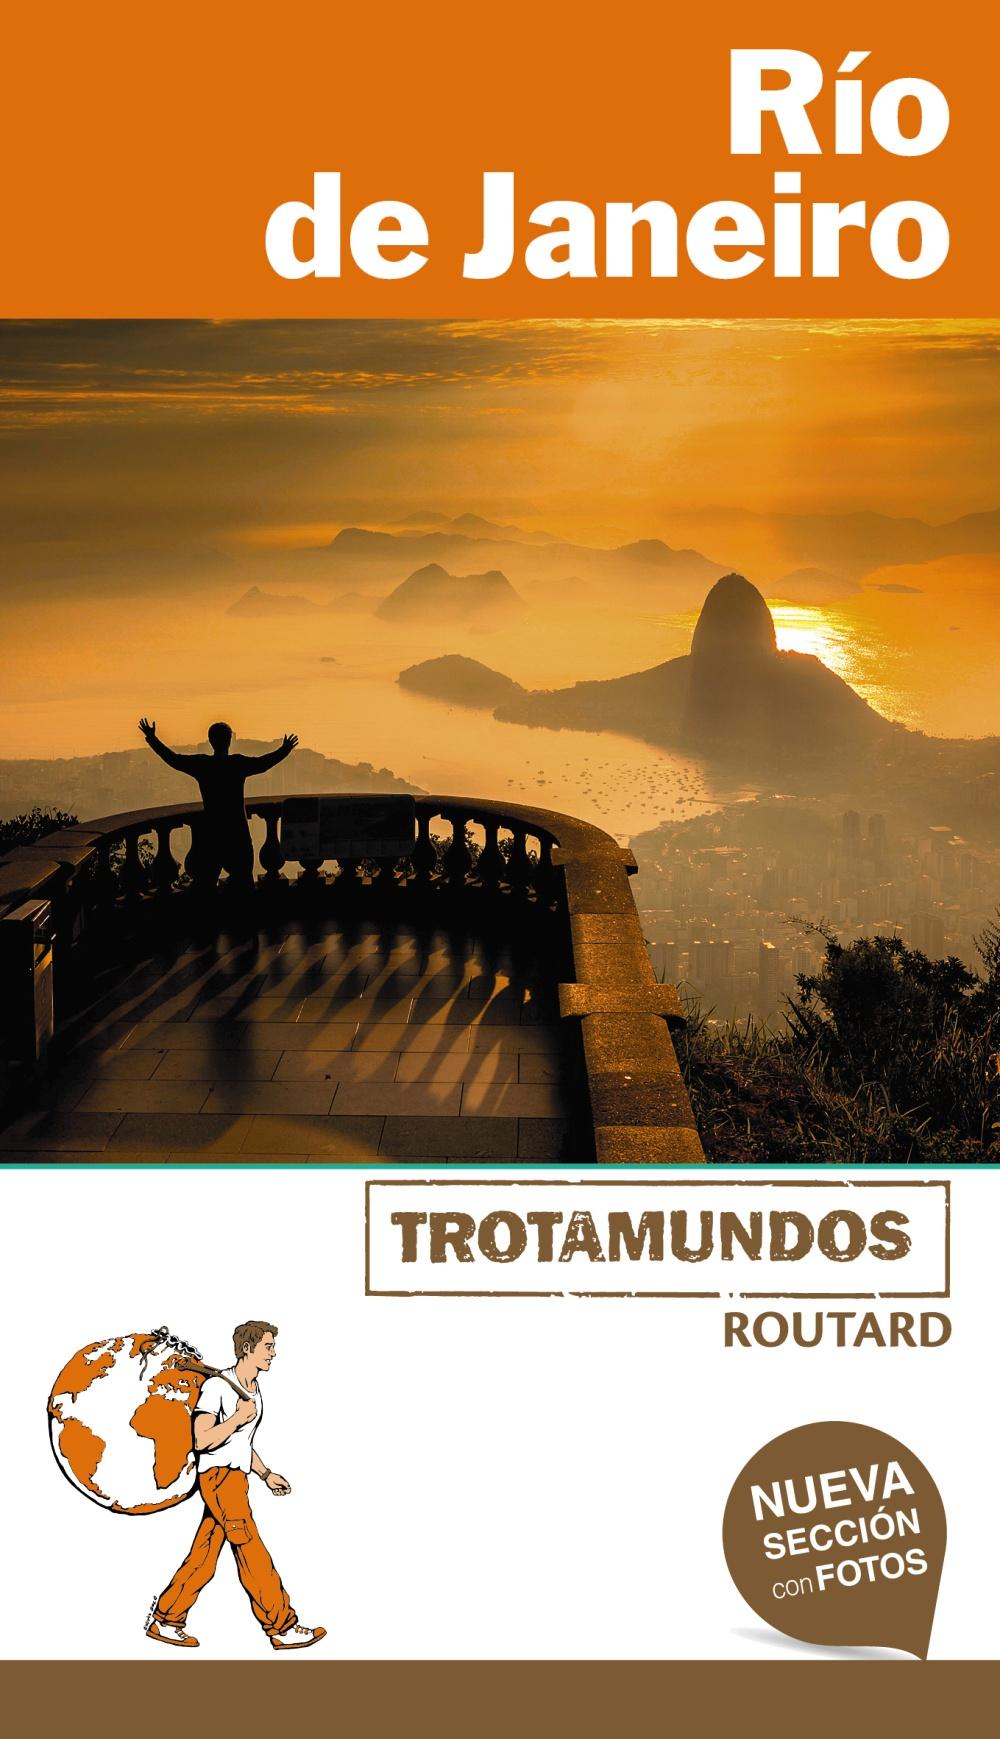 Rio De Janeiro 2018 (trotamundos - Routard) - Gloaguen Philippe